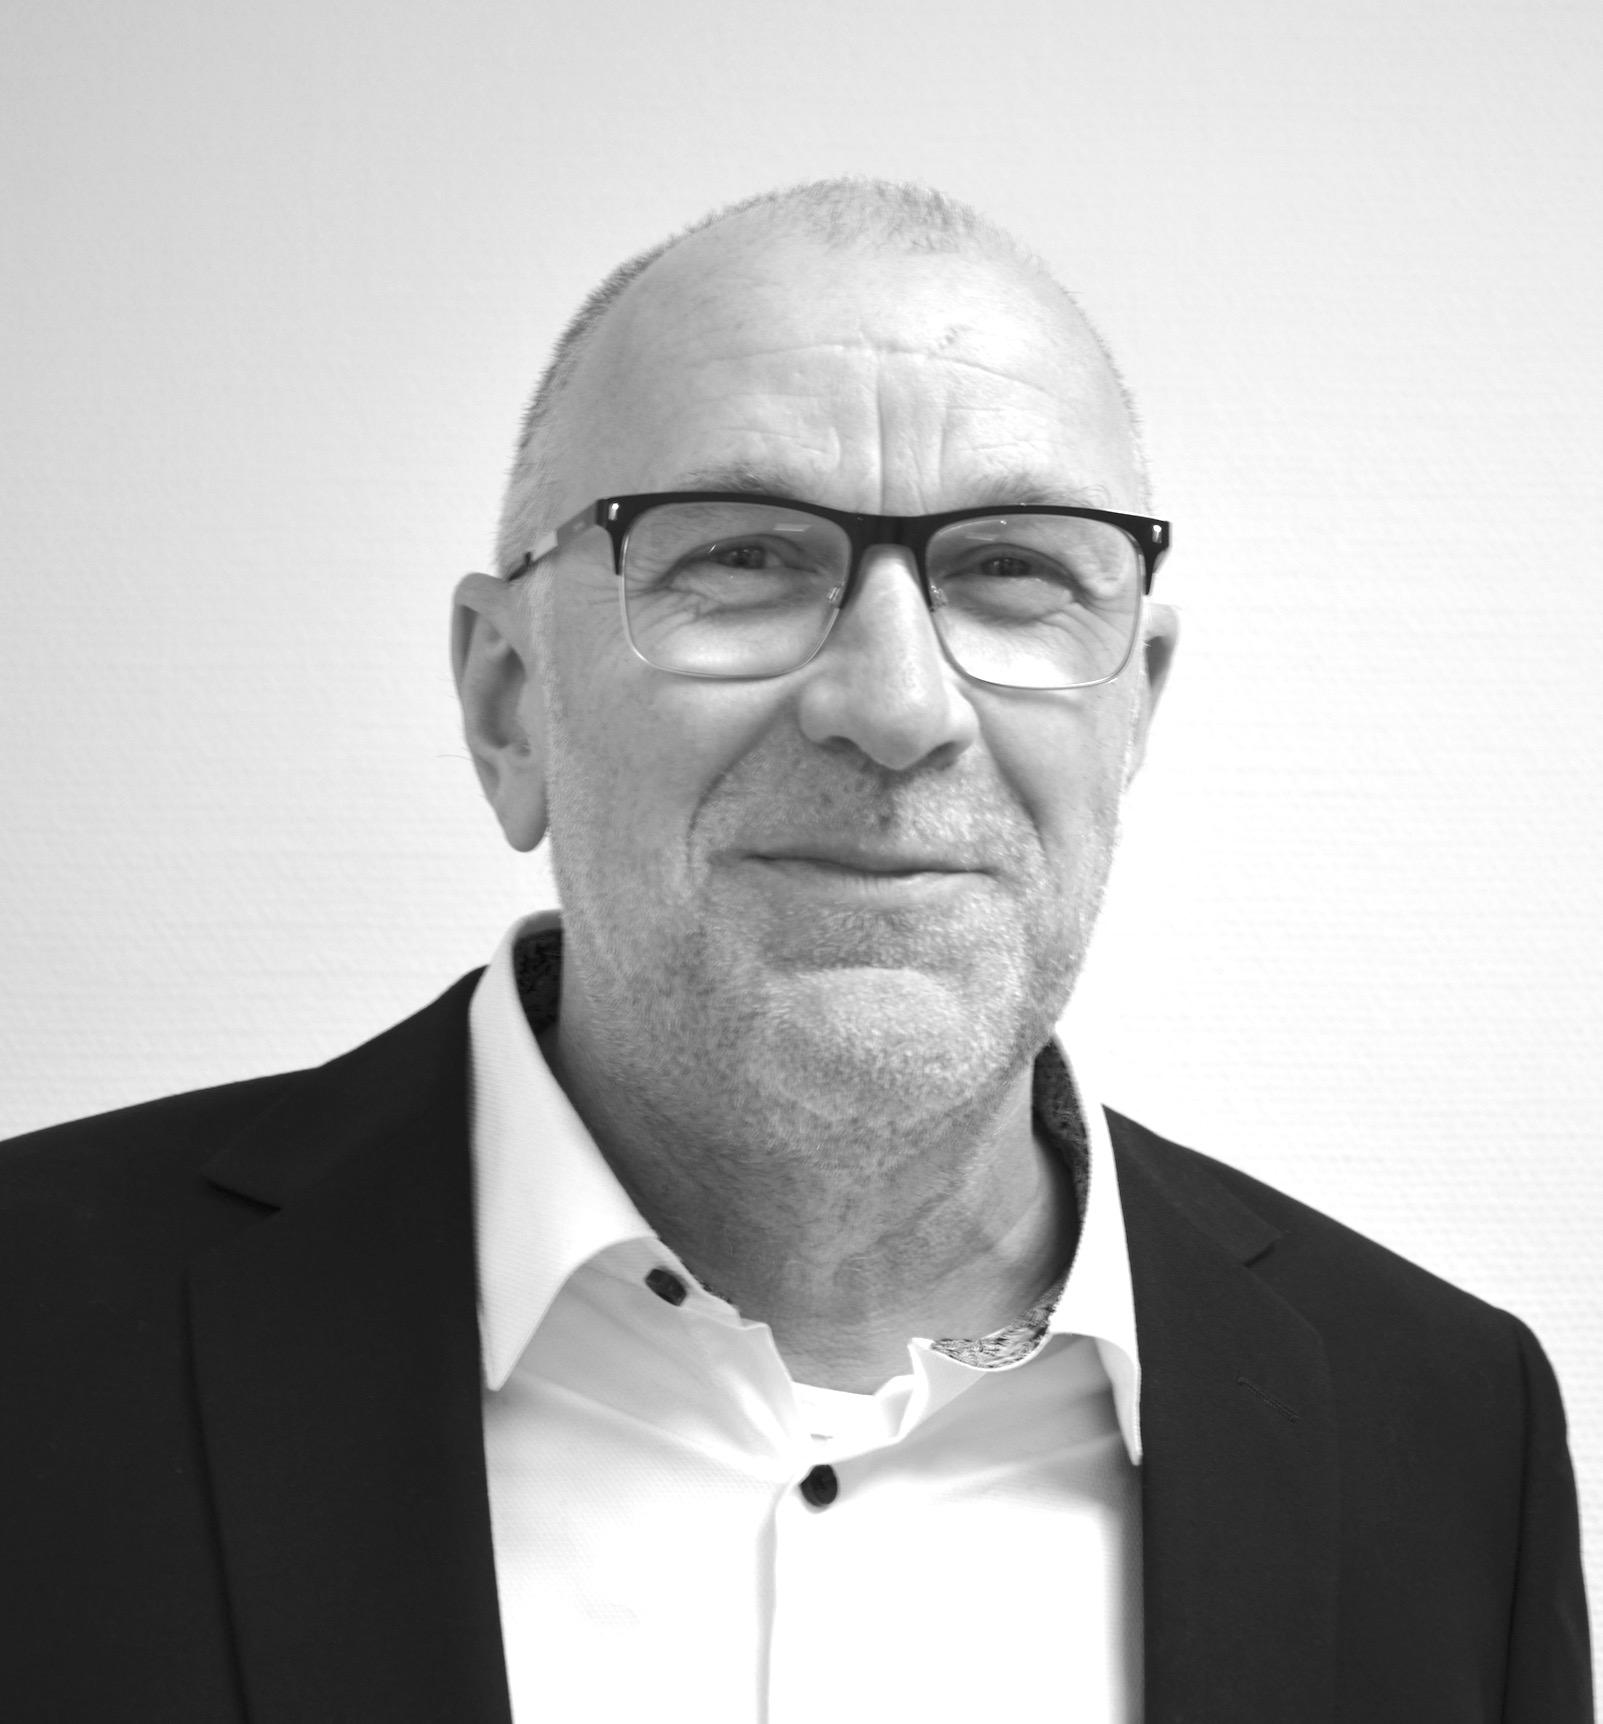 Björn Karlsson